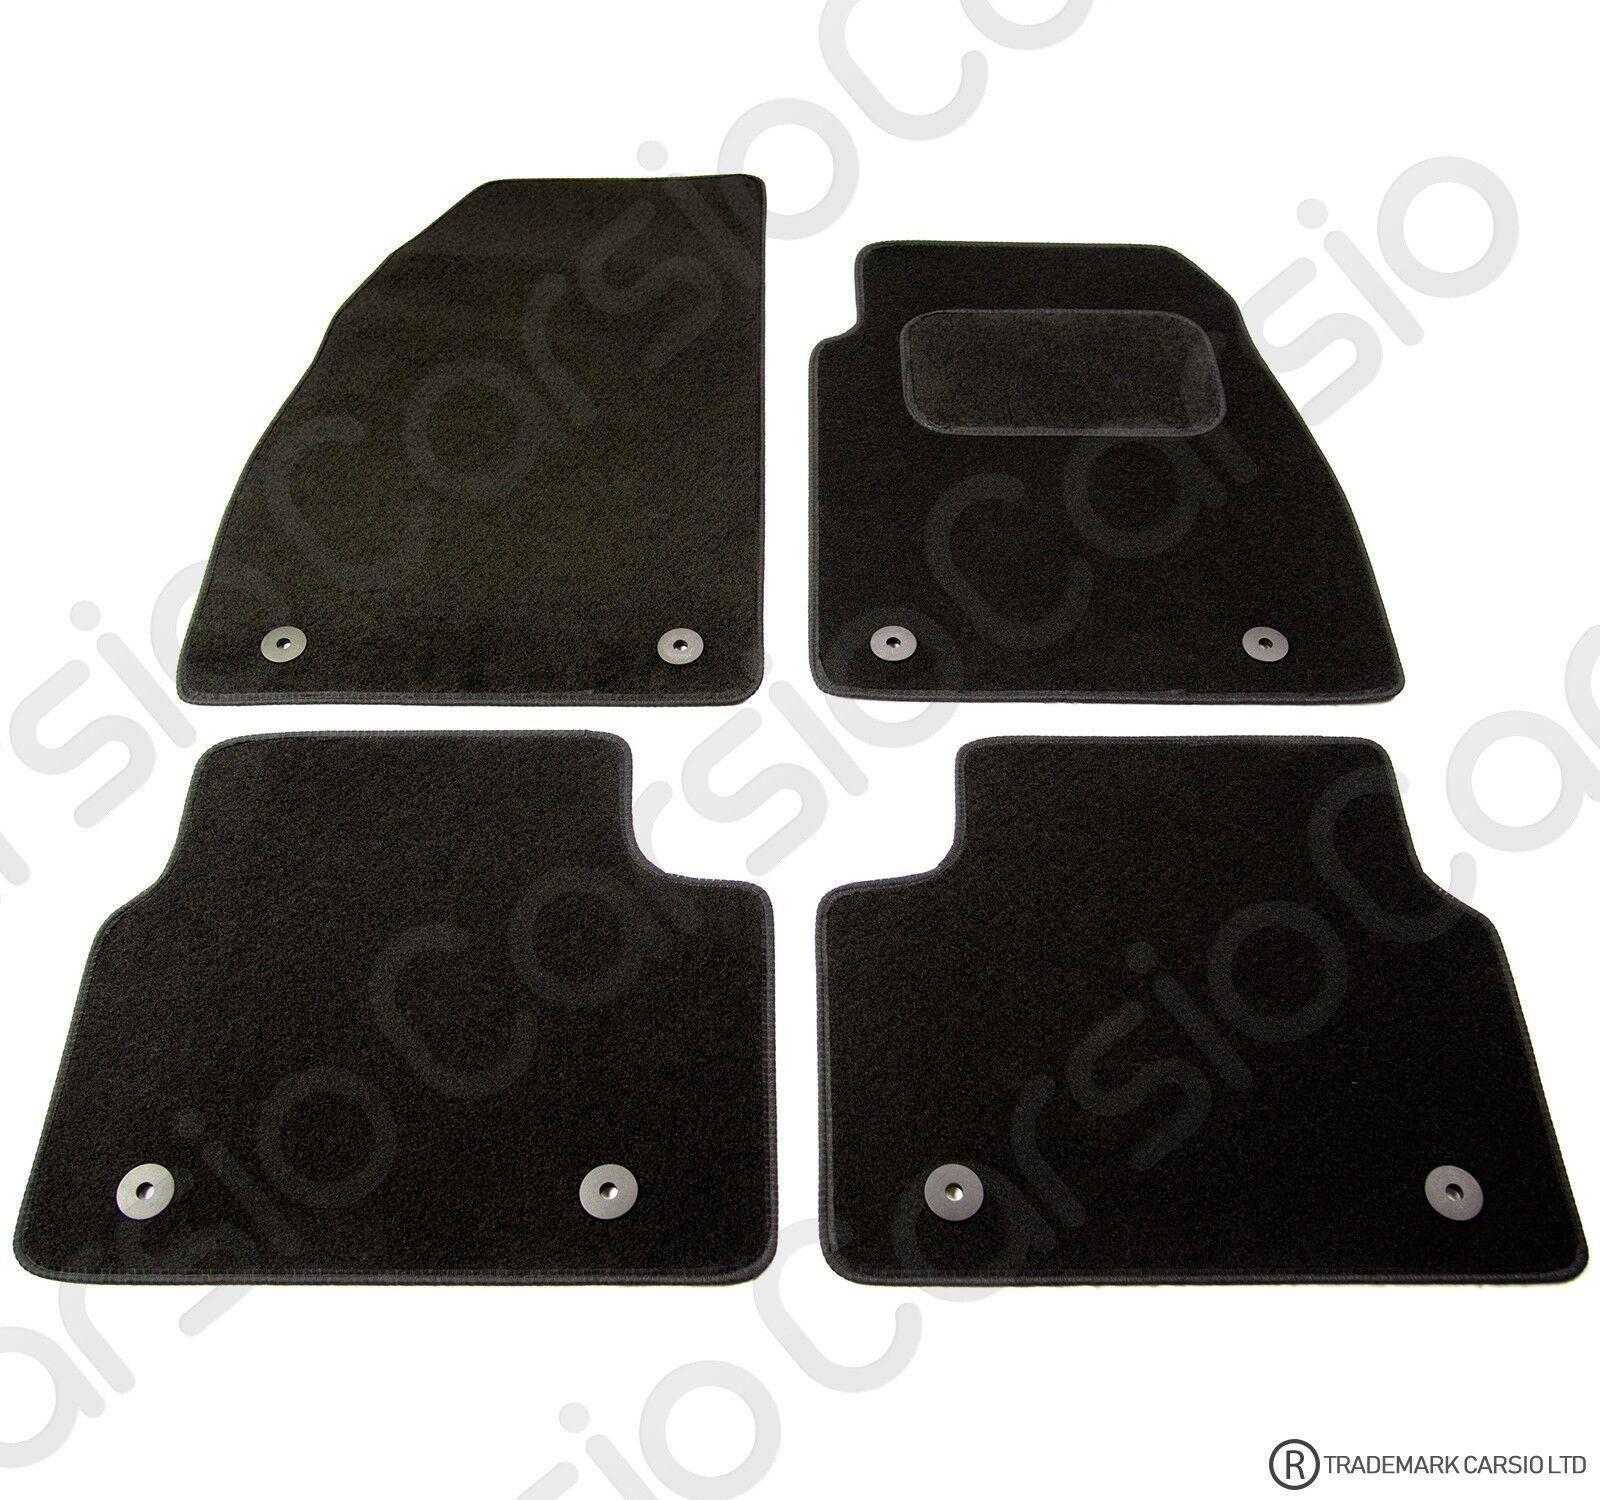 Car Parts - Vauxhall Insignia 2013 to 2017 Tailored Black Car Floor Mats Carpets 4 piece Set